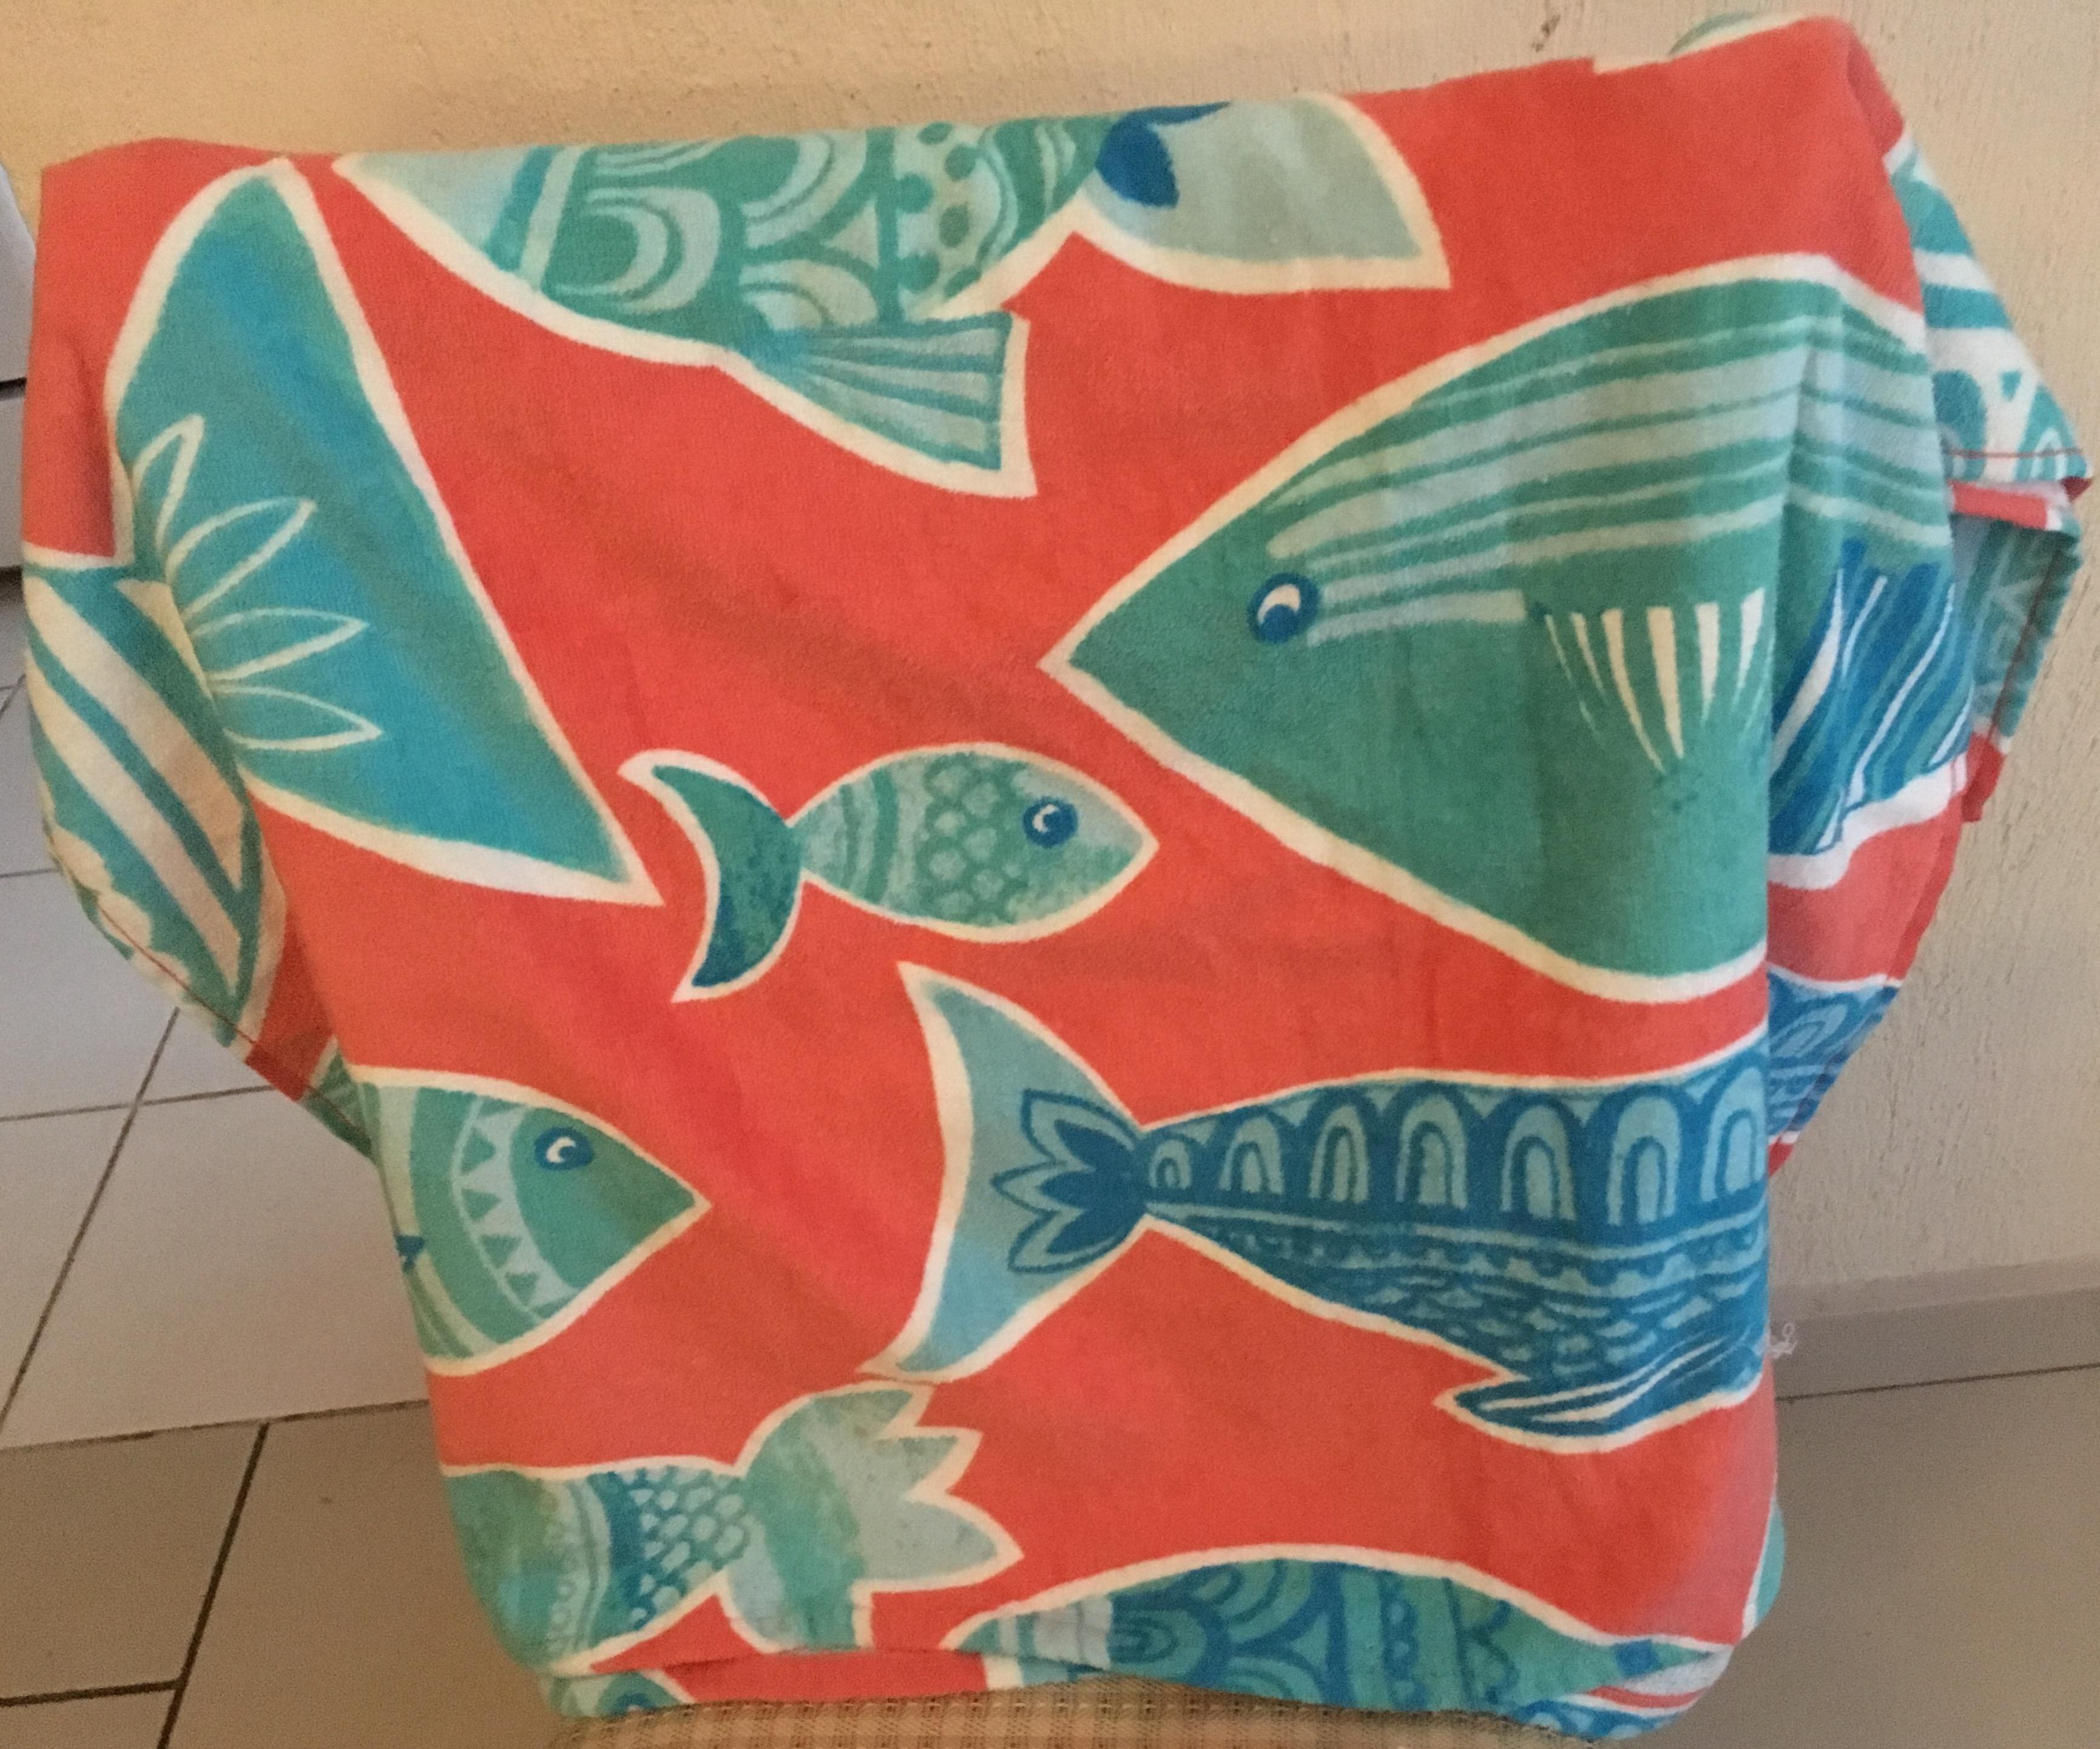 Walmart Metepec EDOMEX: toalla de playa $17.01